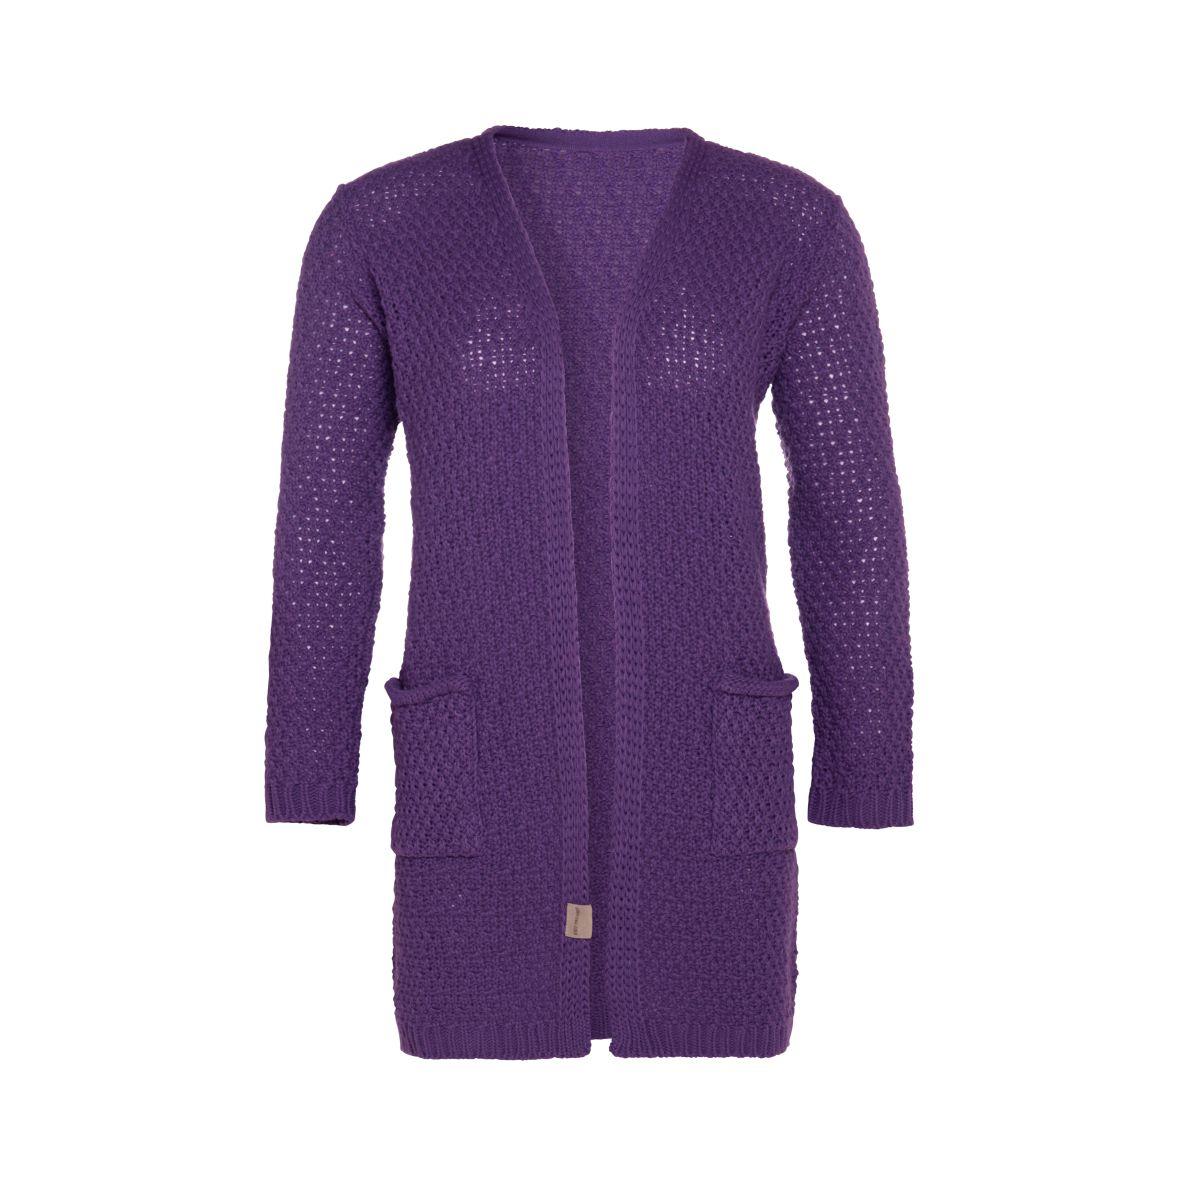 knit factory kf13308112351 luna vest purple 4042 1